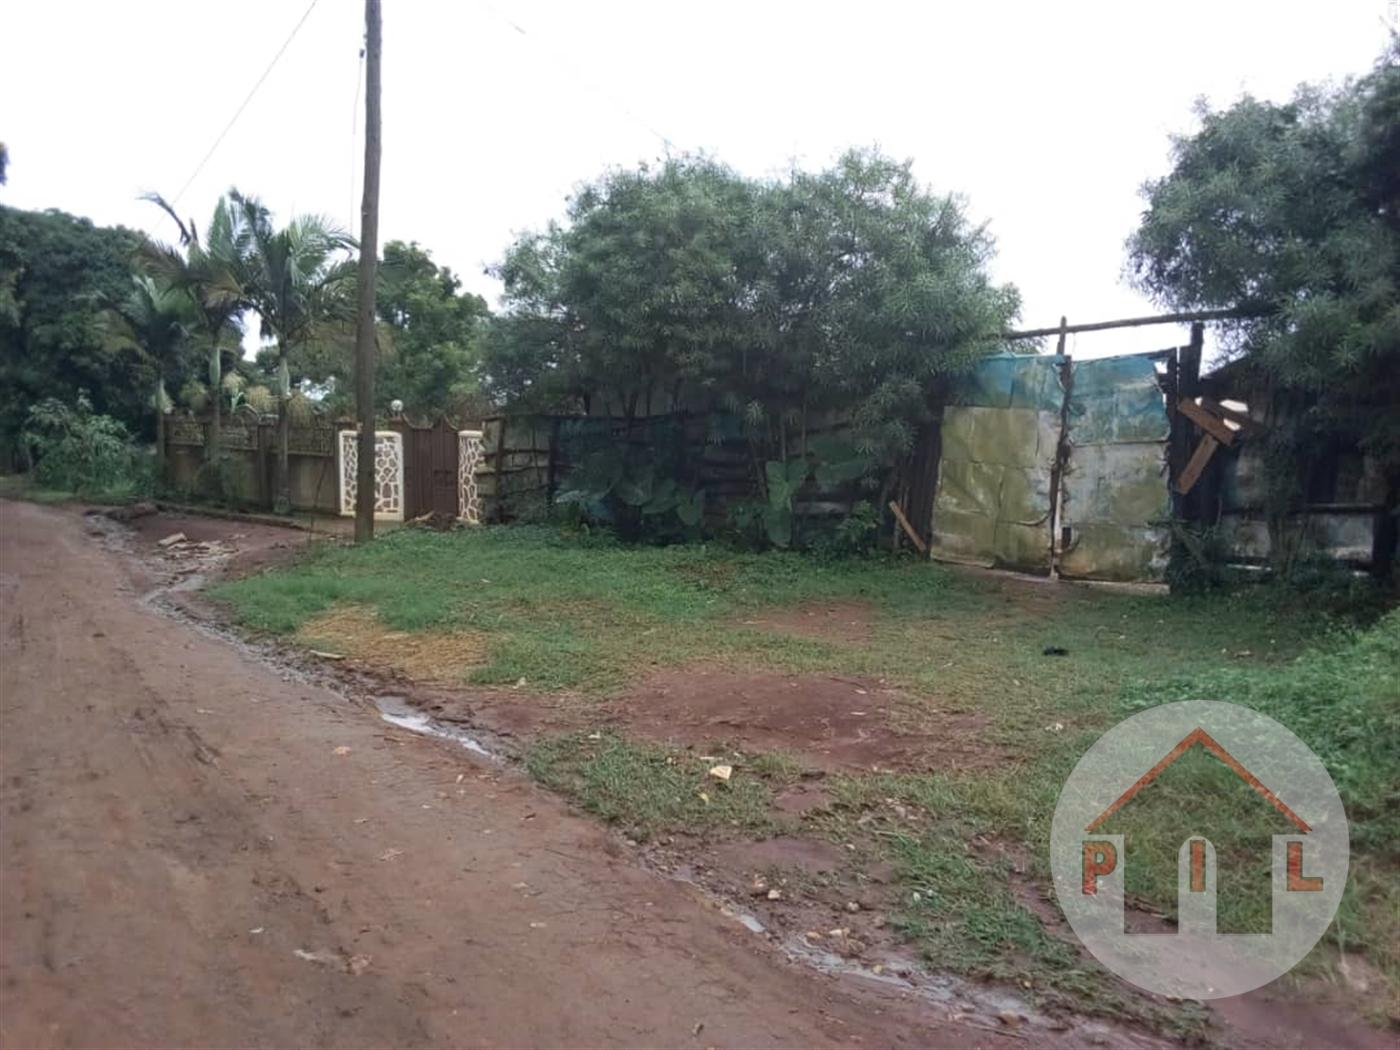 Residential Land for sale in Namanve Wakiso